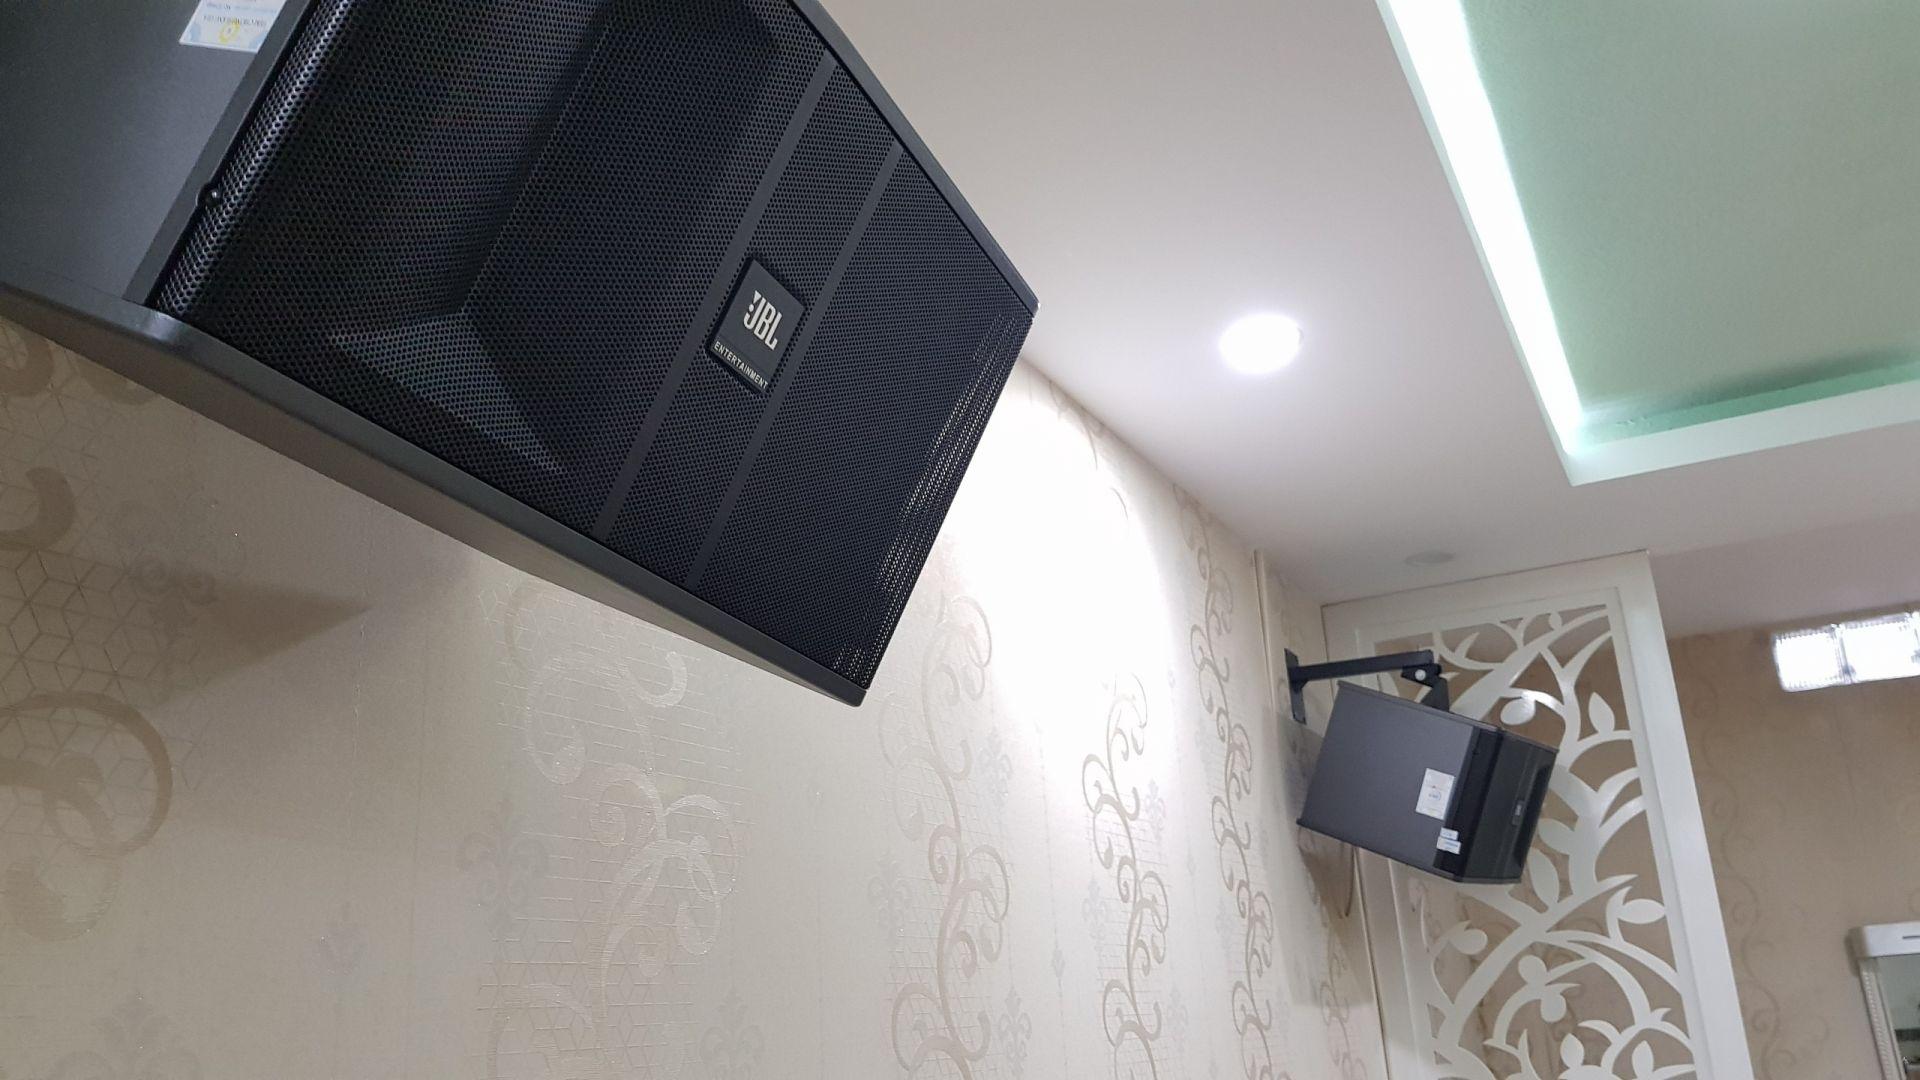 Loa JBL bộ dàn karaoke TVAP06 cận cảnh